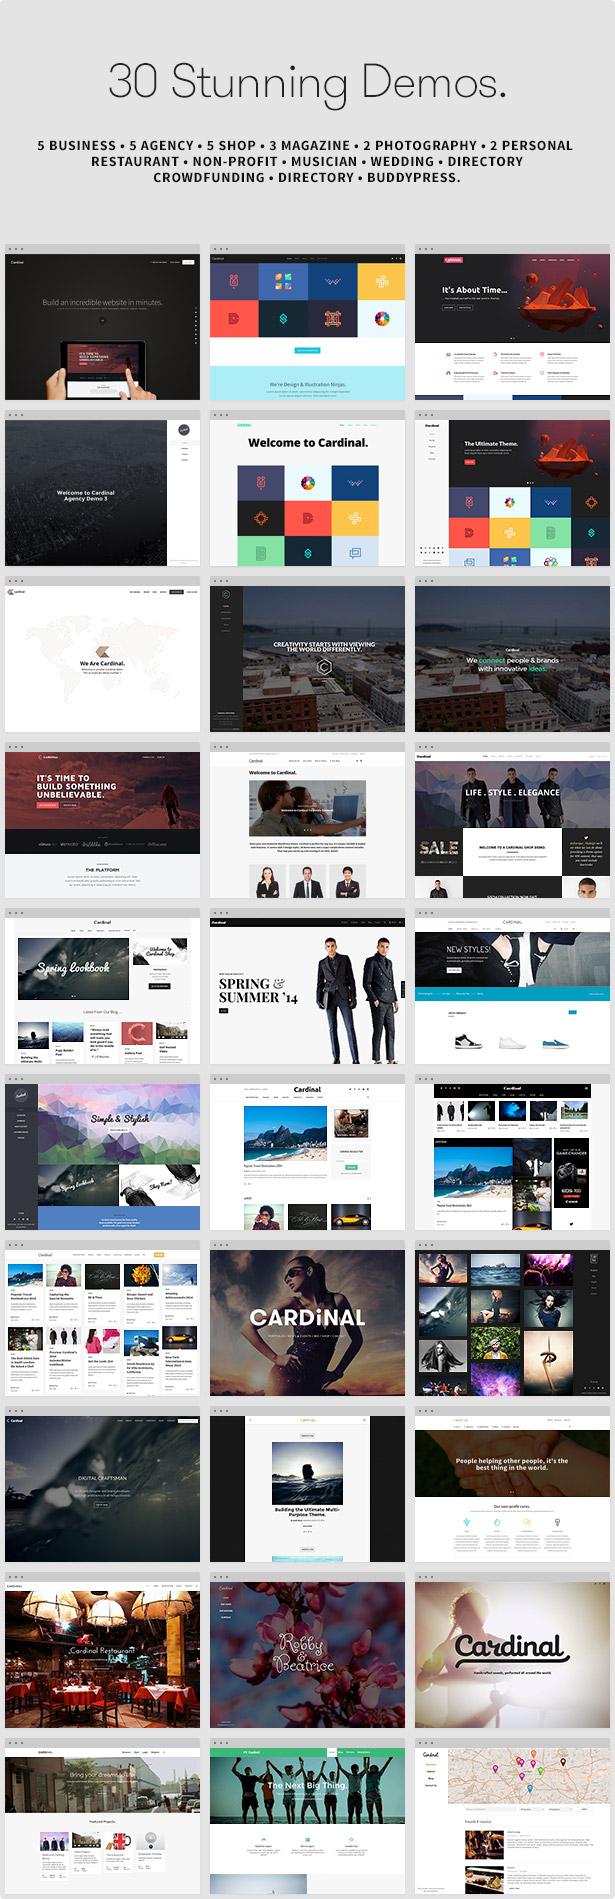 Cardinal - WordPress Theme - 10